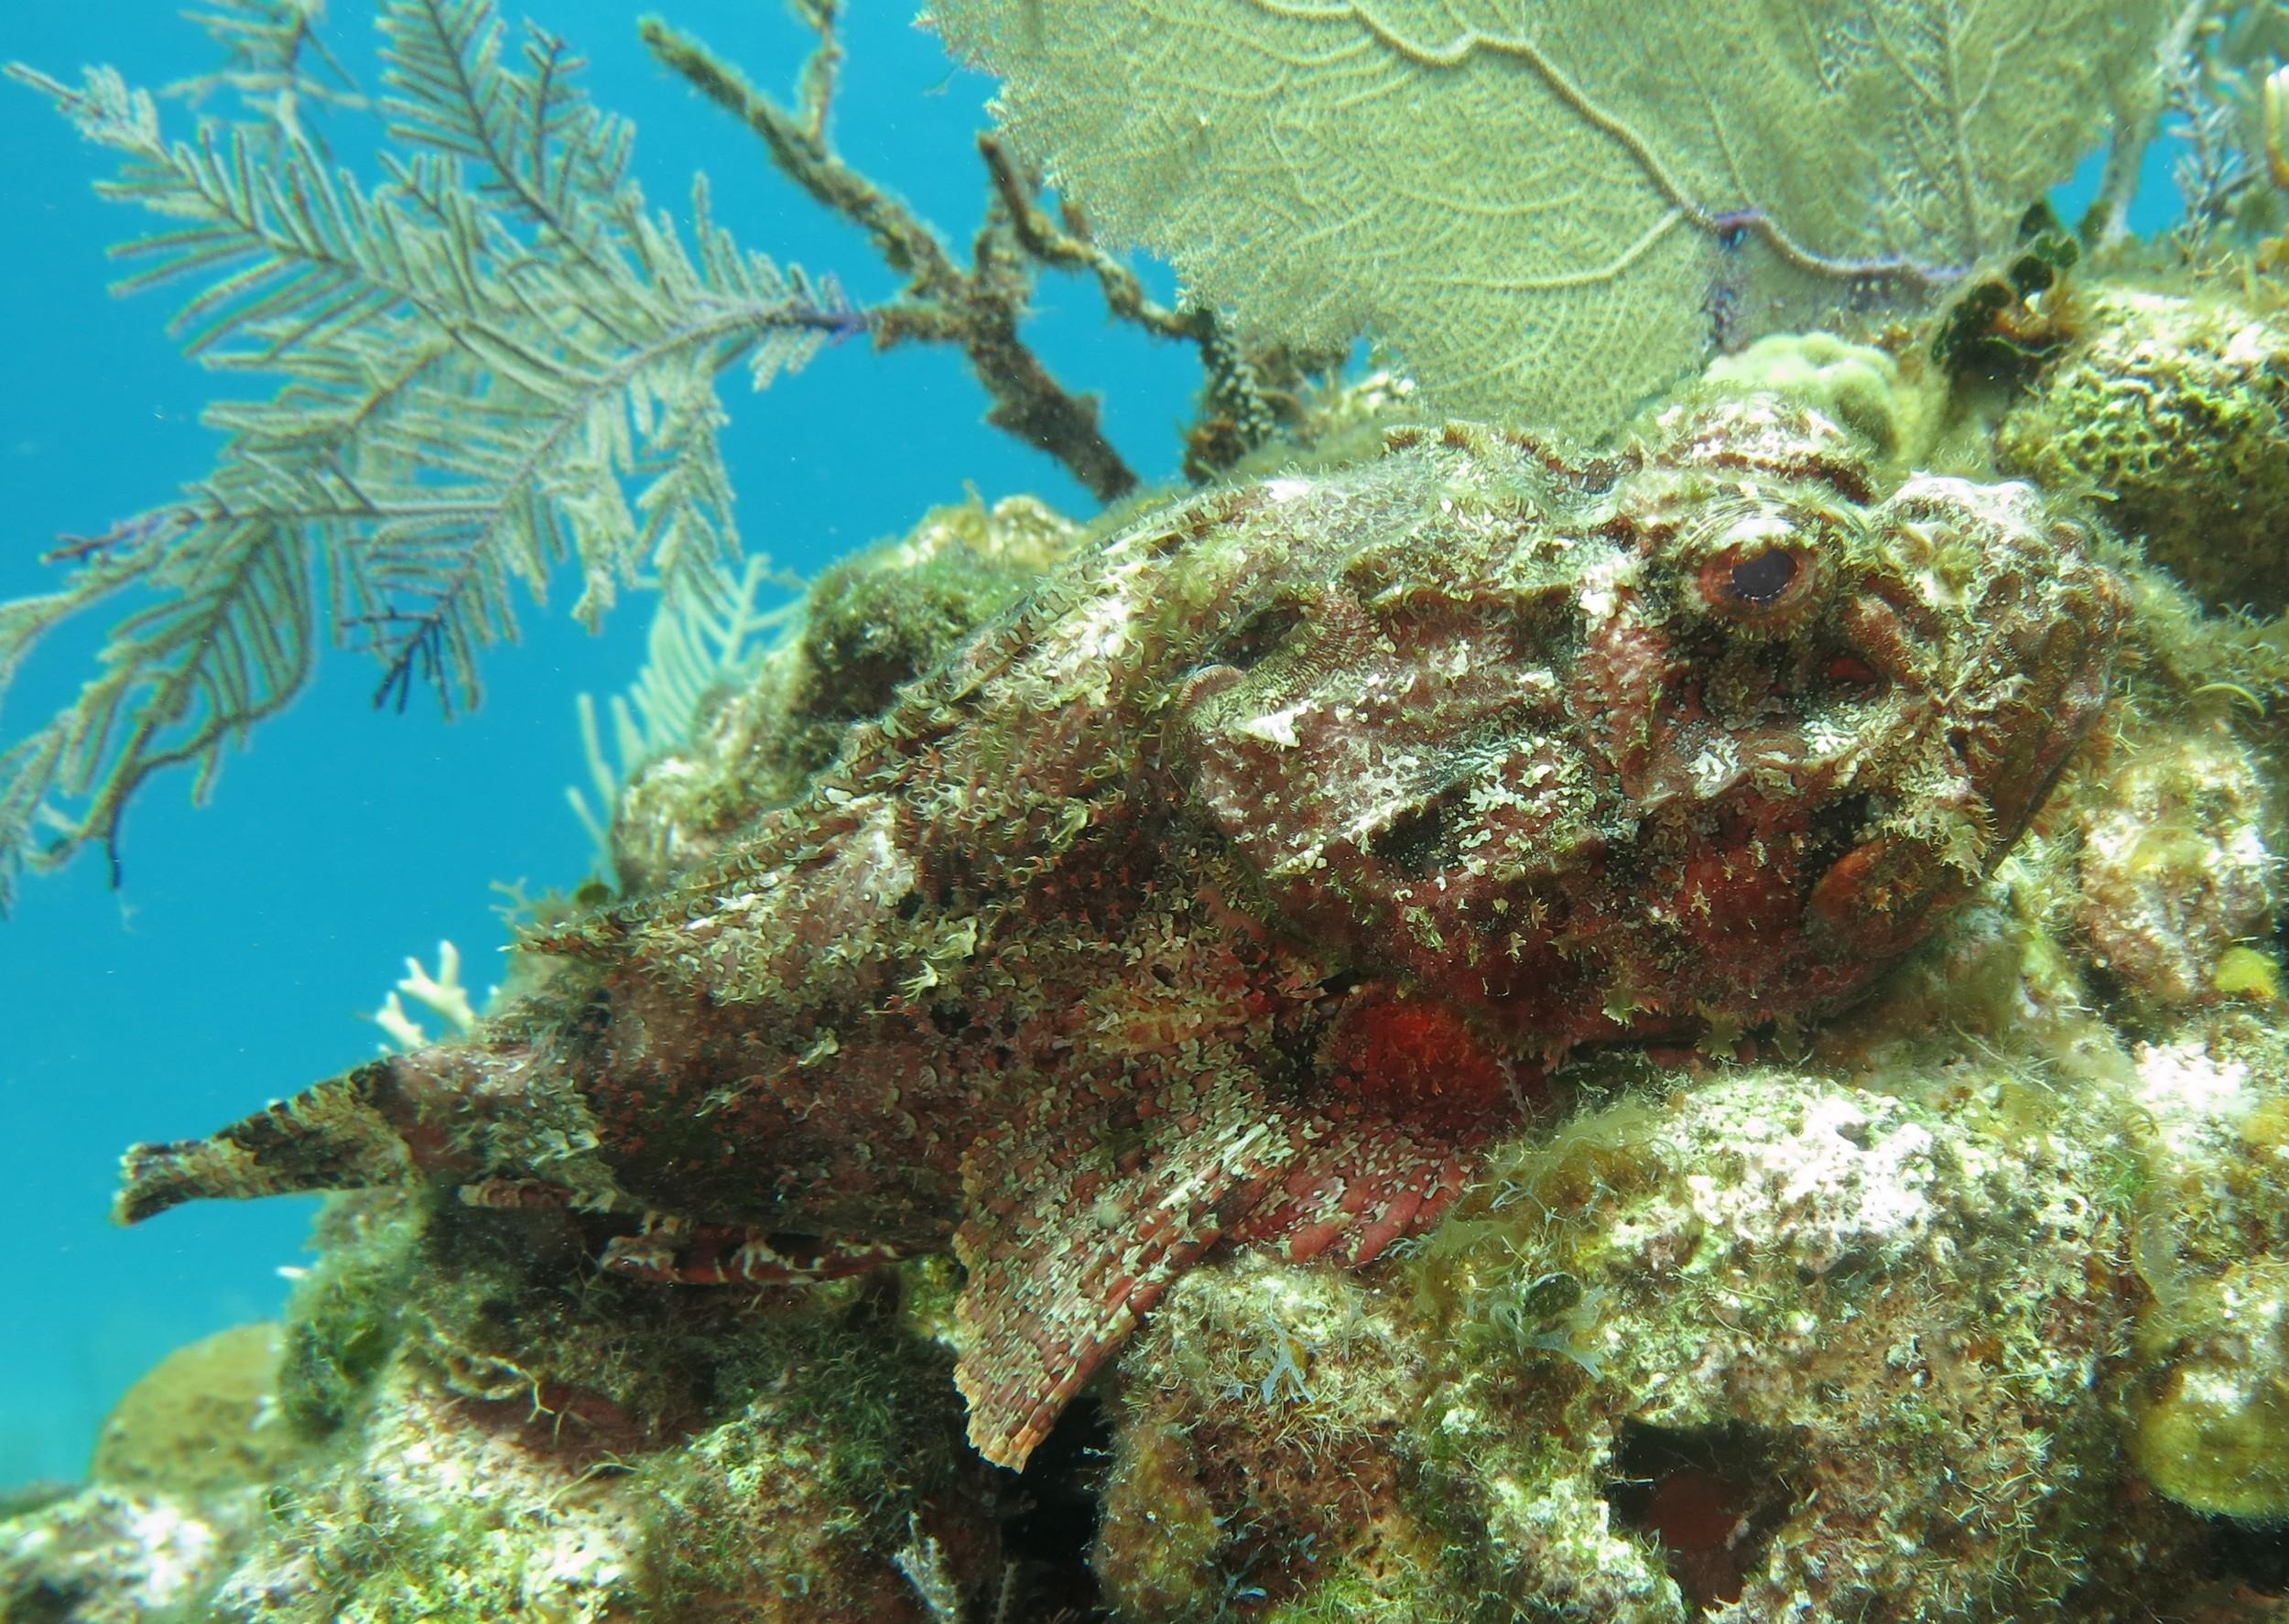 Scorpionfish